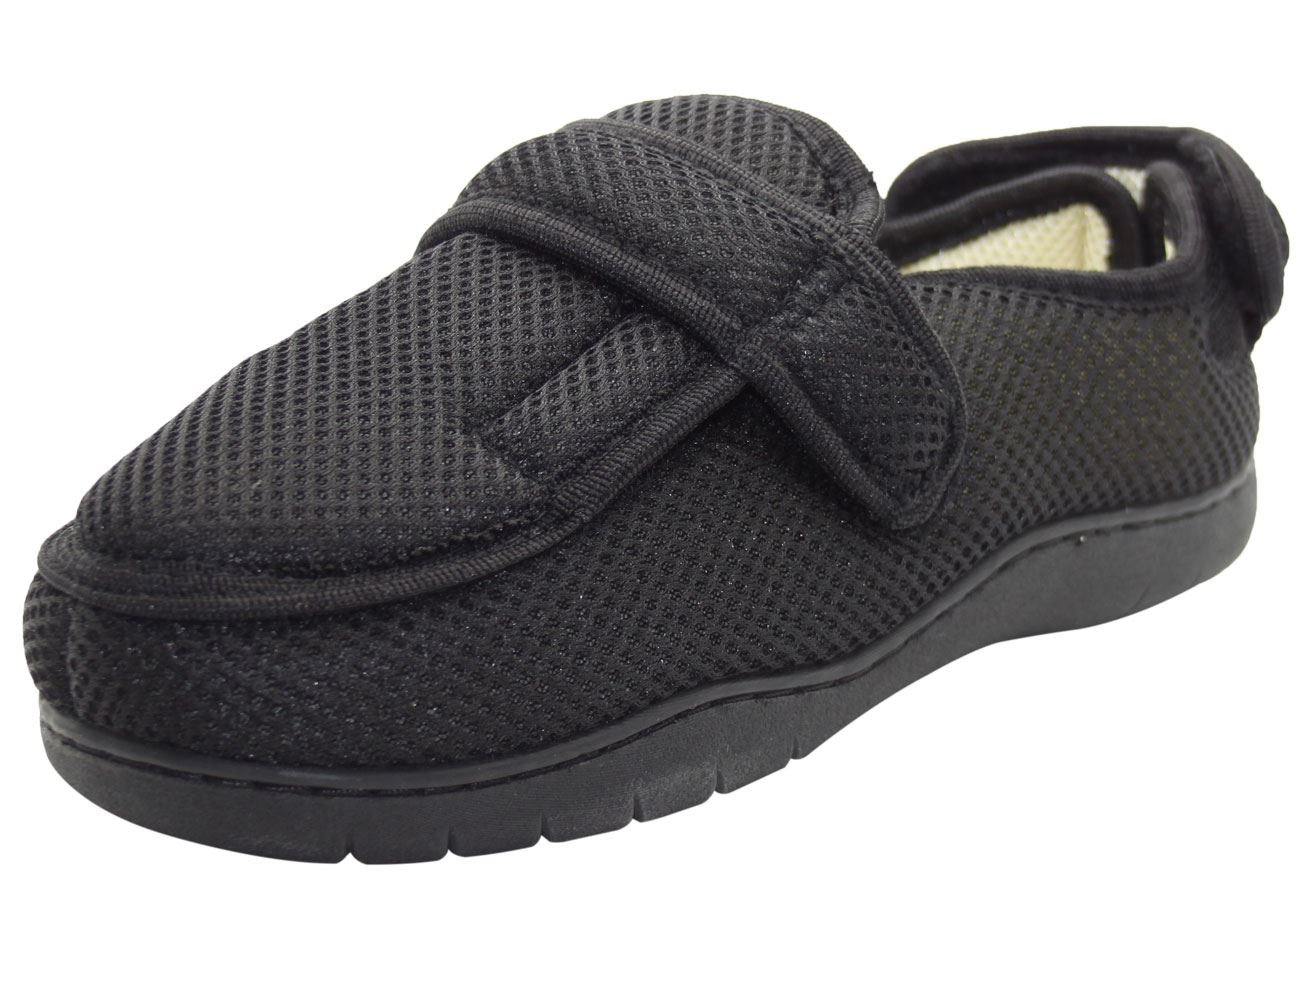 b6bada9e1e True Face Men Ladies Diabetic Slippers Orthopedic Memory Foam Wide Fitting  Shoes